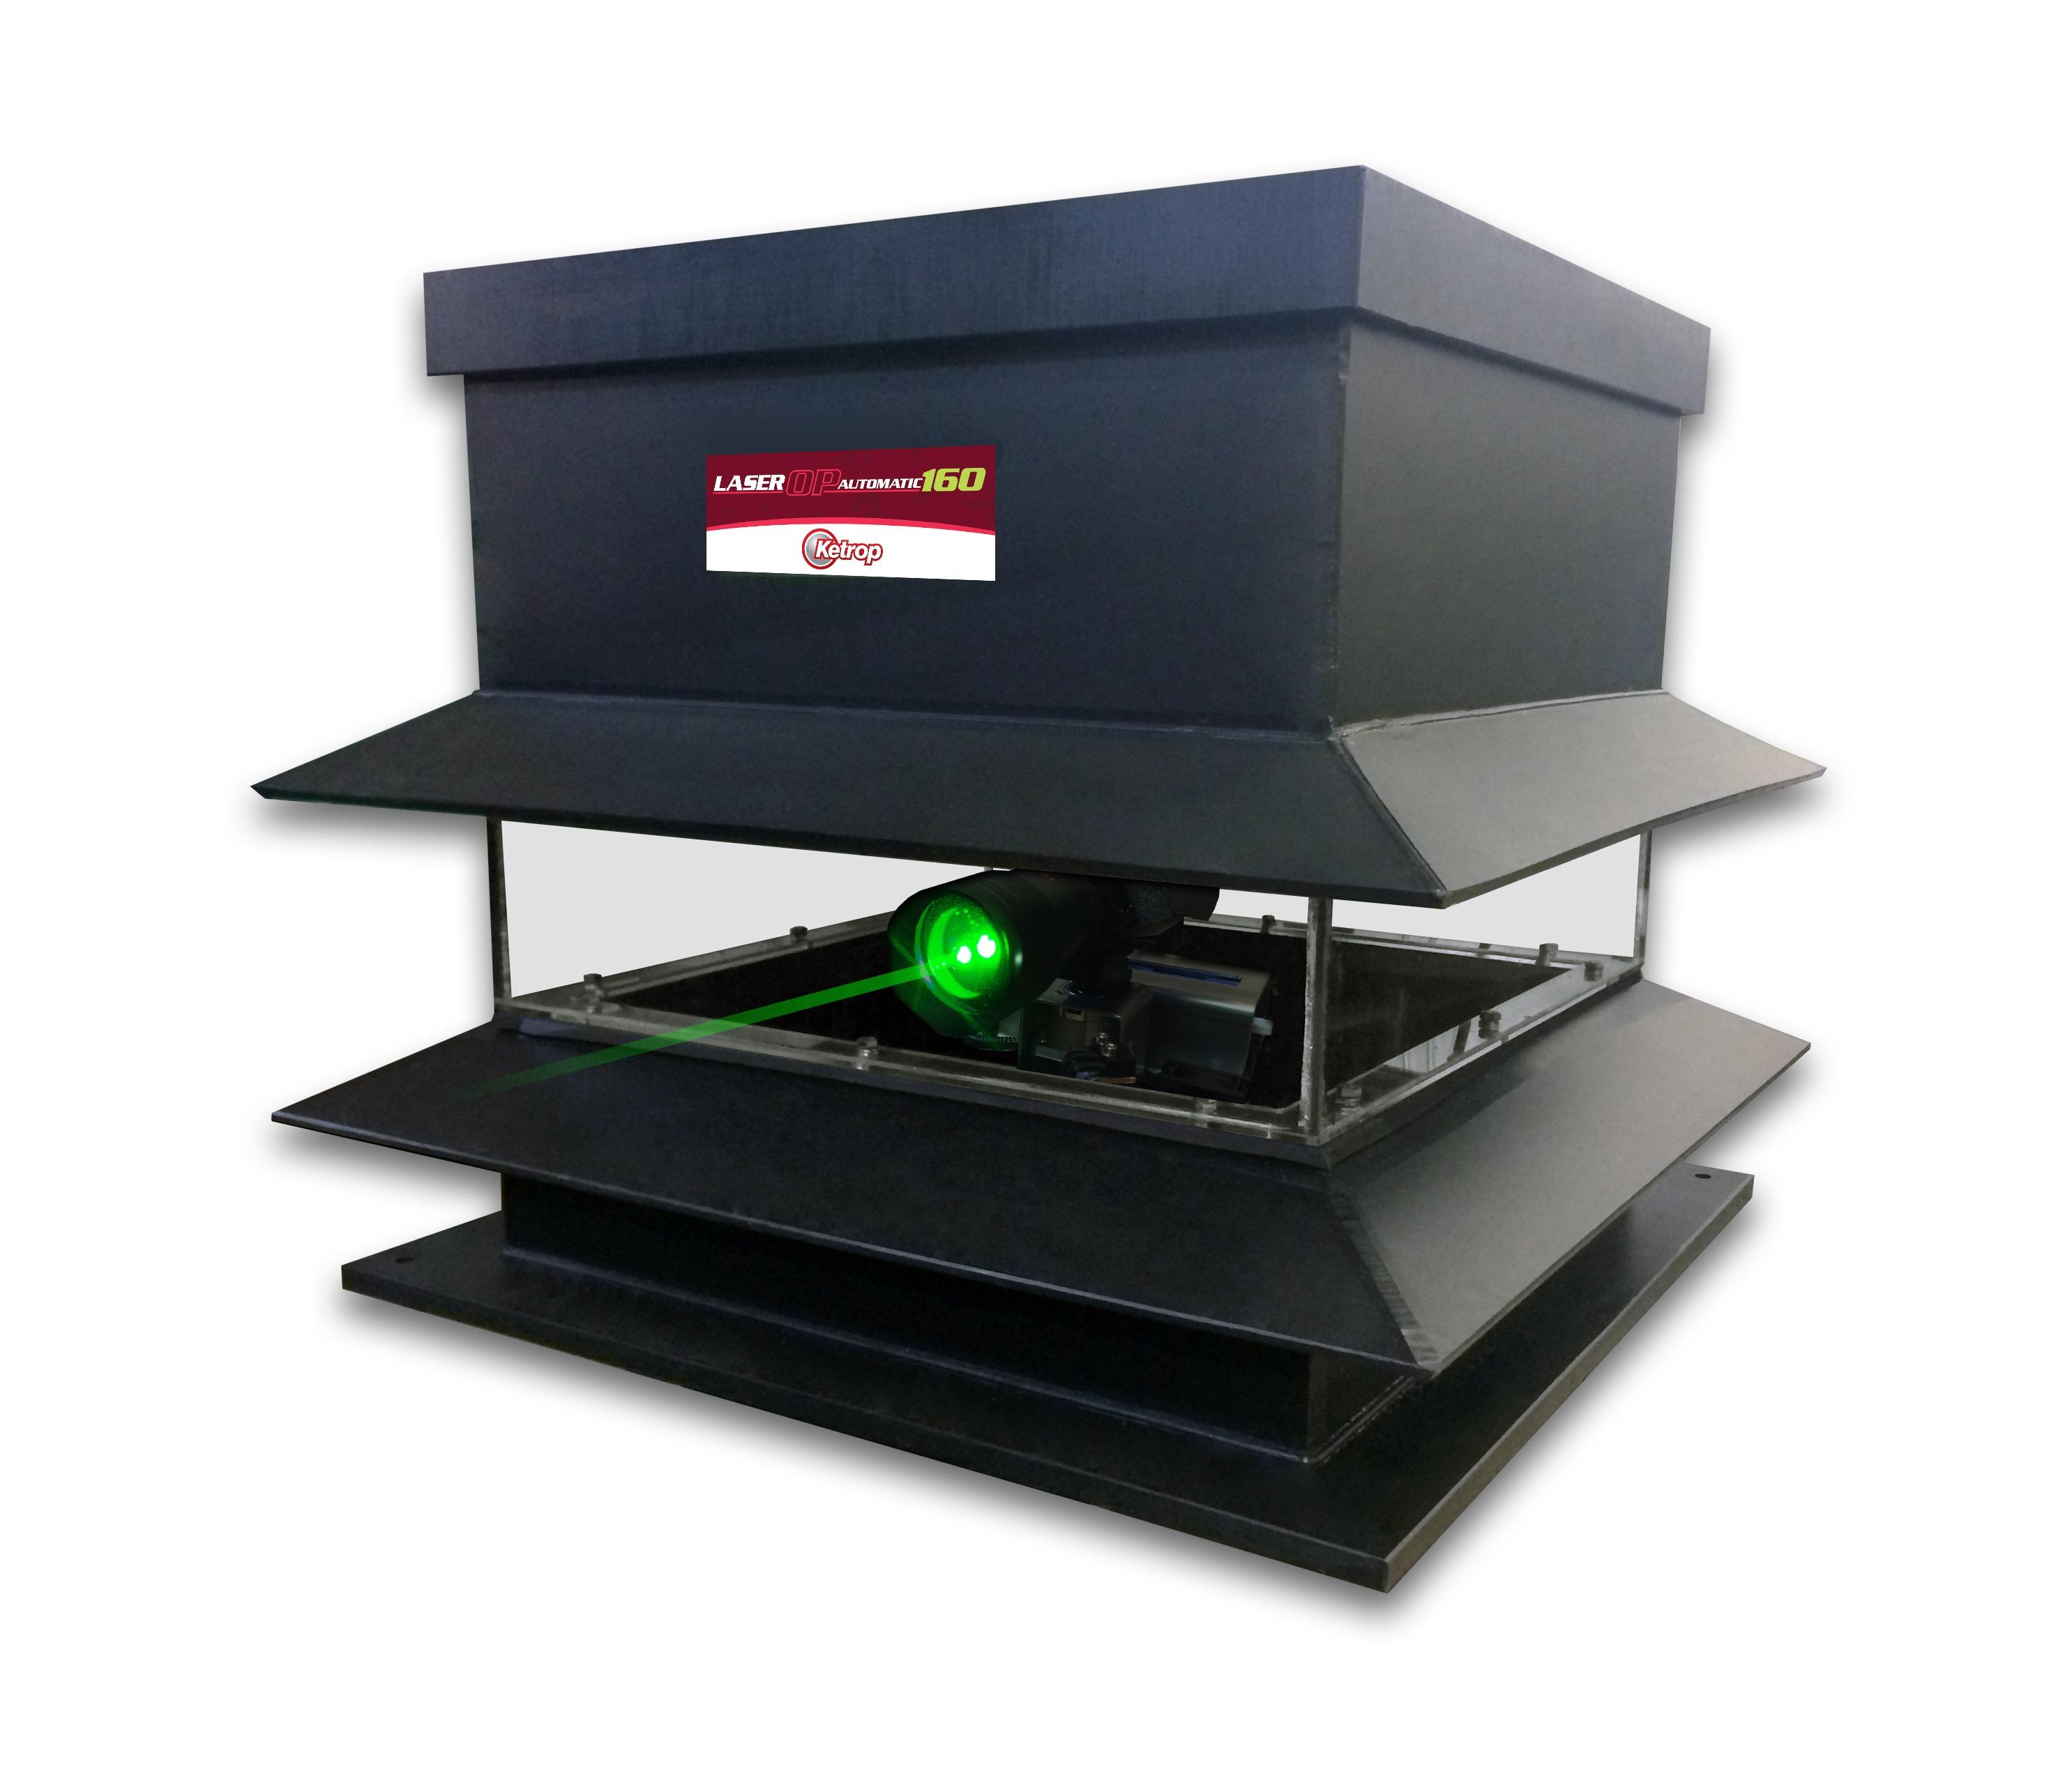 018 LaserOp Automatic 160 red logo